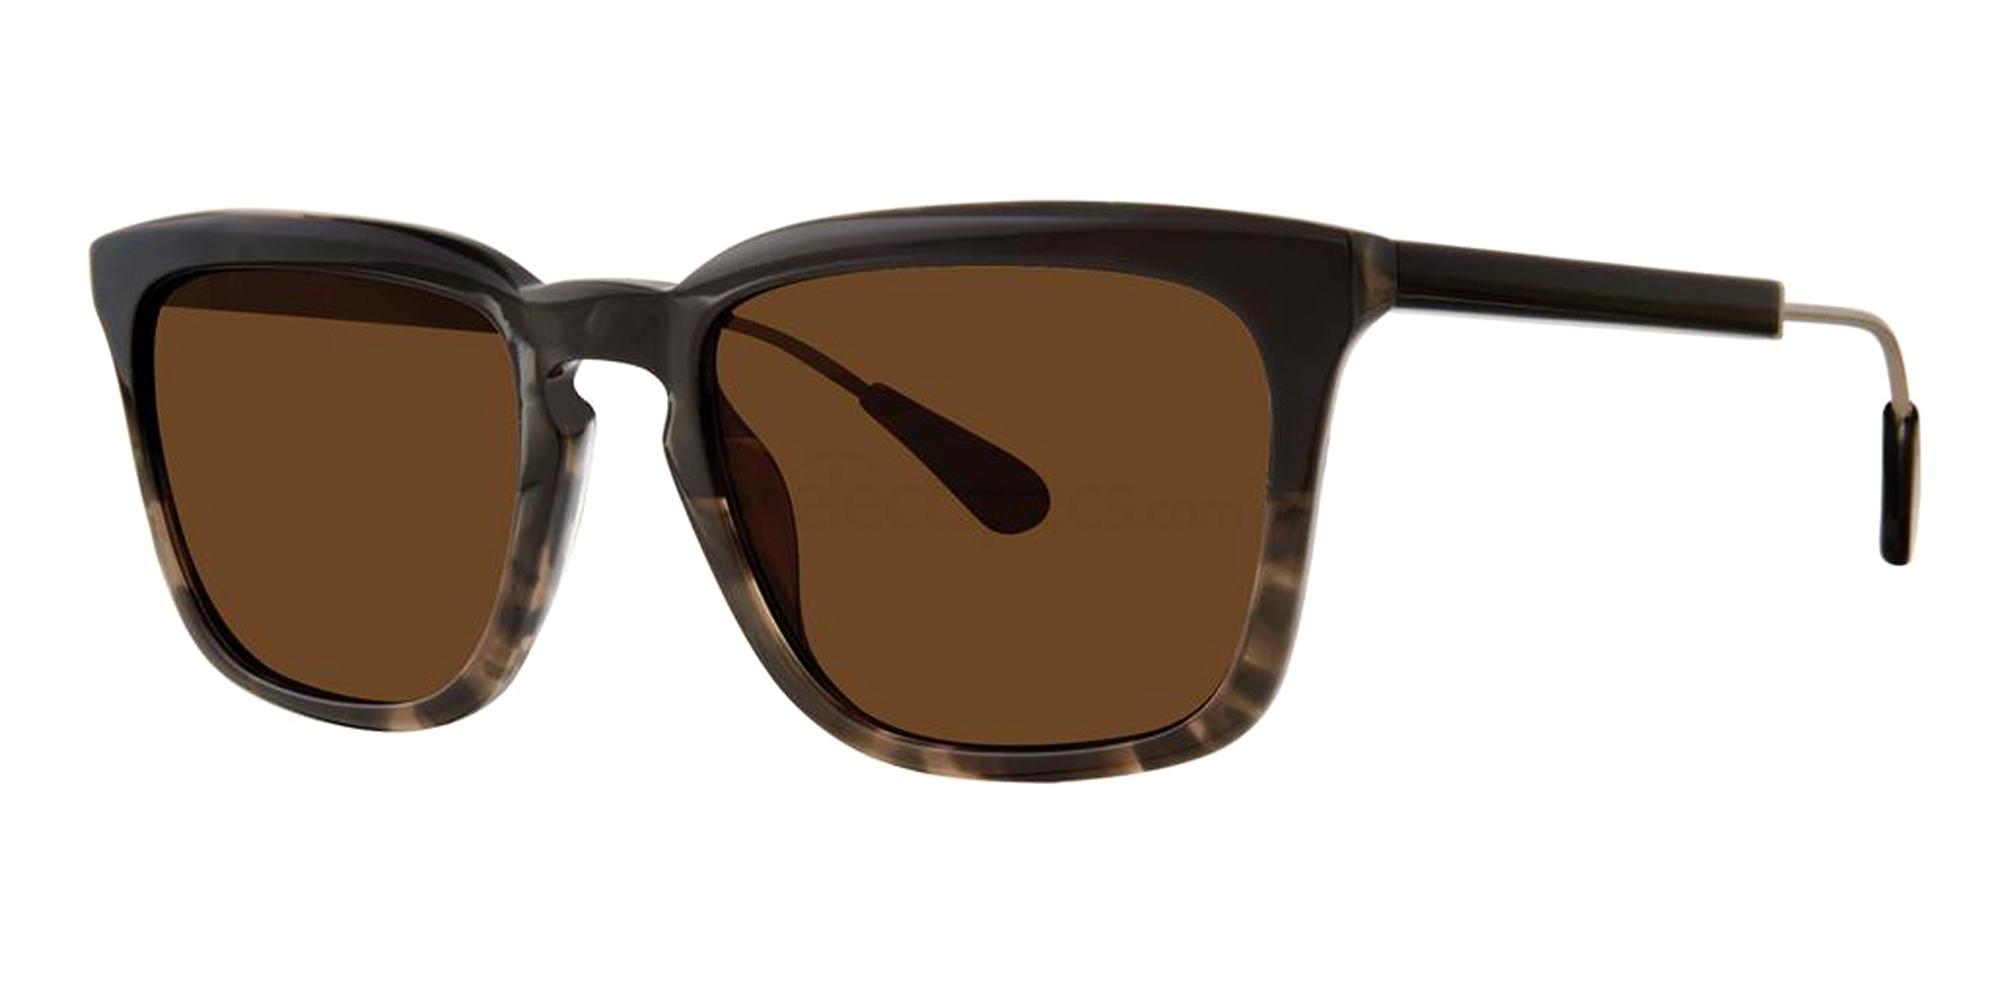 Ink Tortoise MILWOOD Sunglasses, Zac Posen